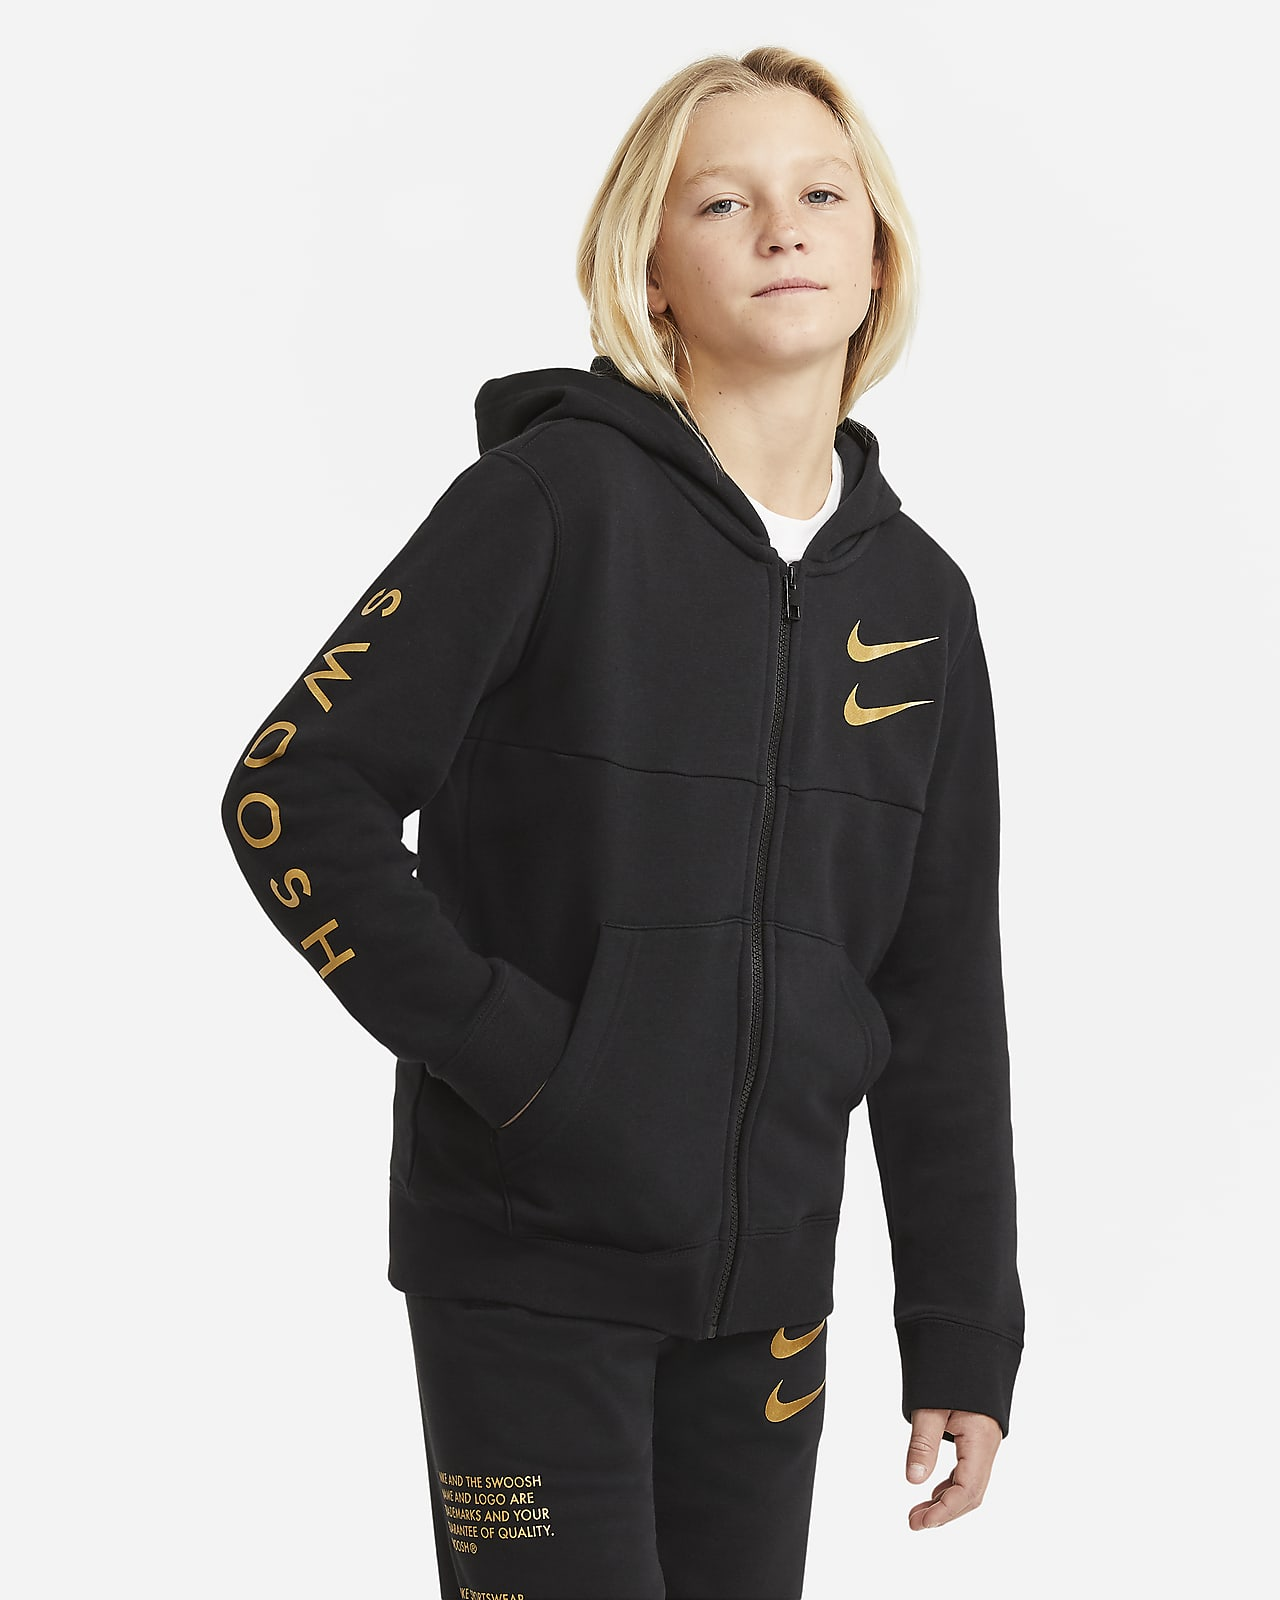 Hoodie com fecho completo Nike Sportswear Swoosh Júnior (Rapaz)